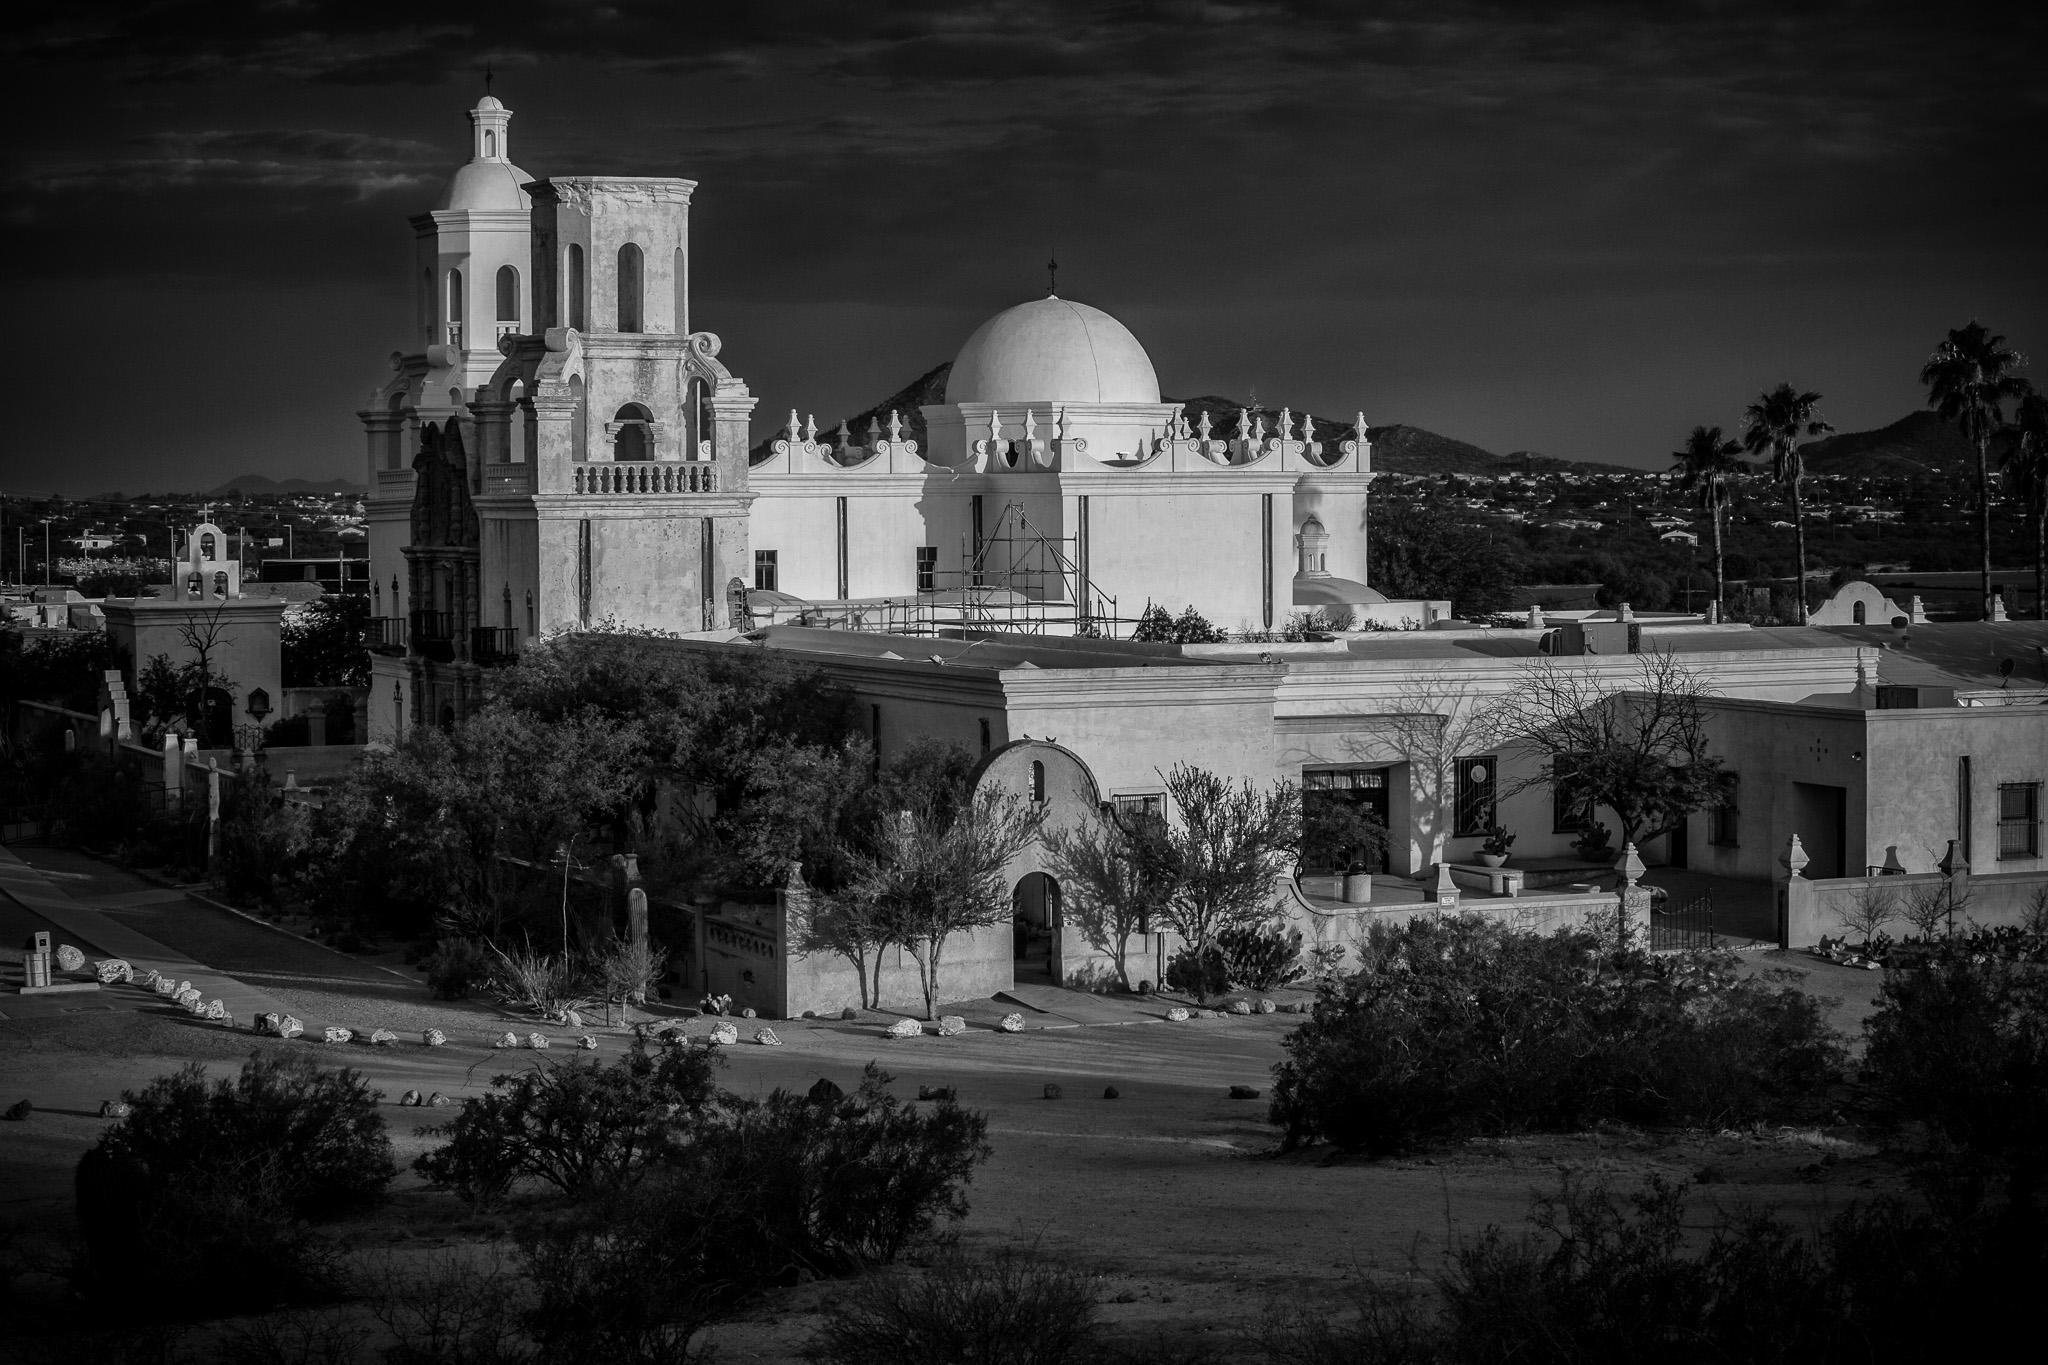 Mission San Xavier del Bac #3 - Tucson